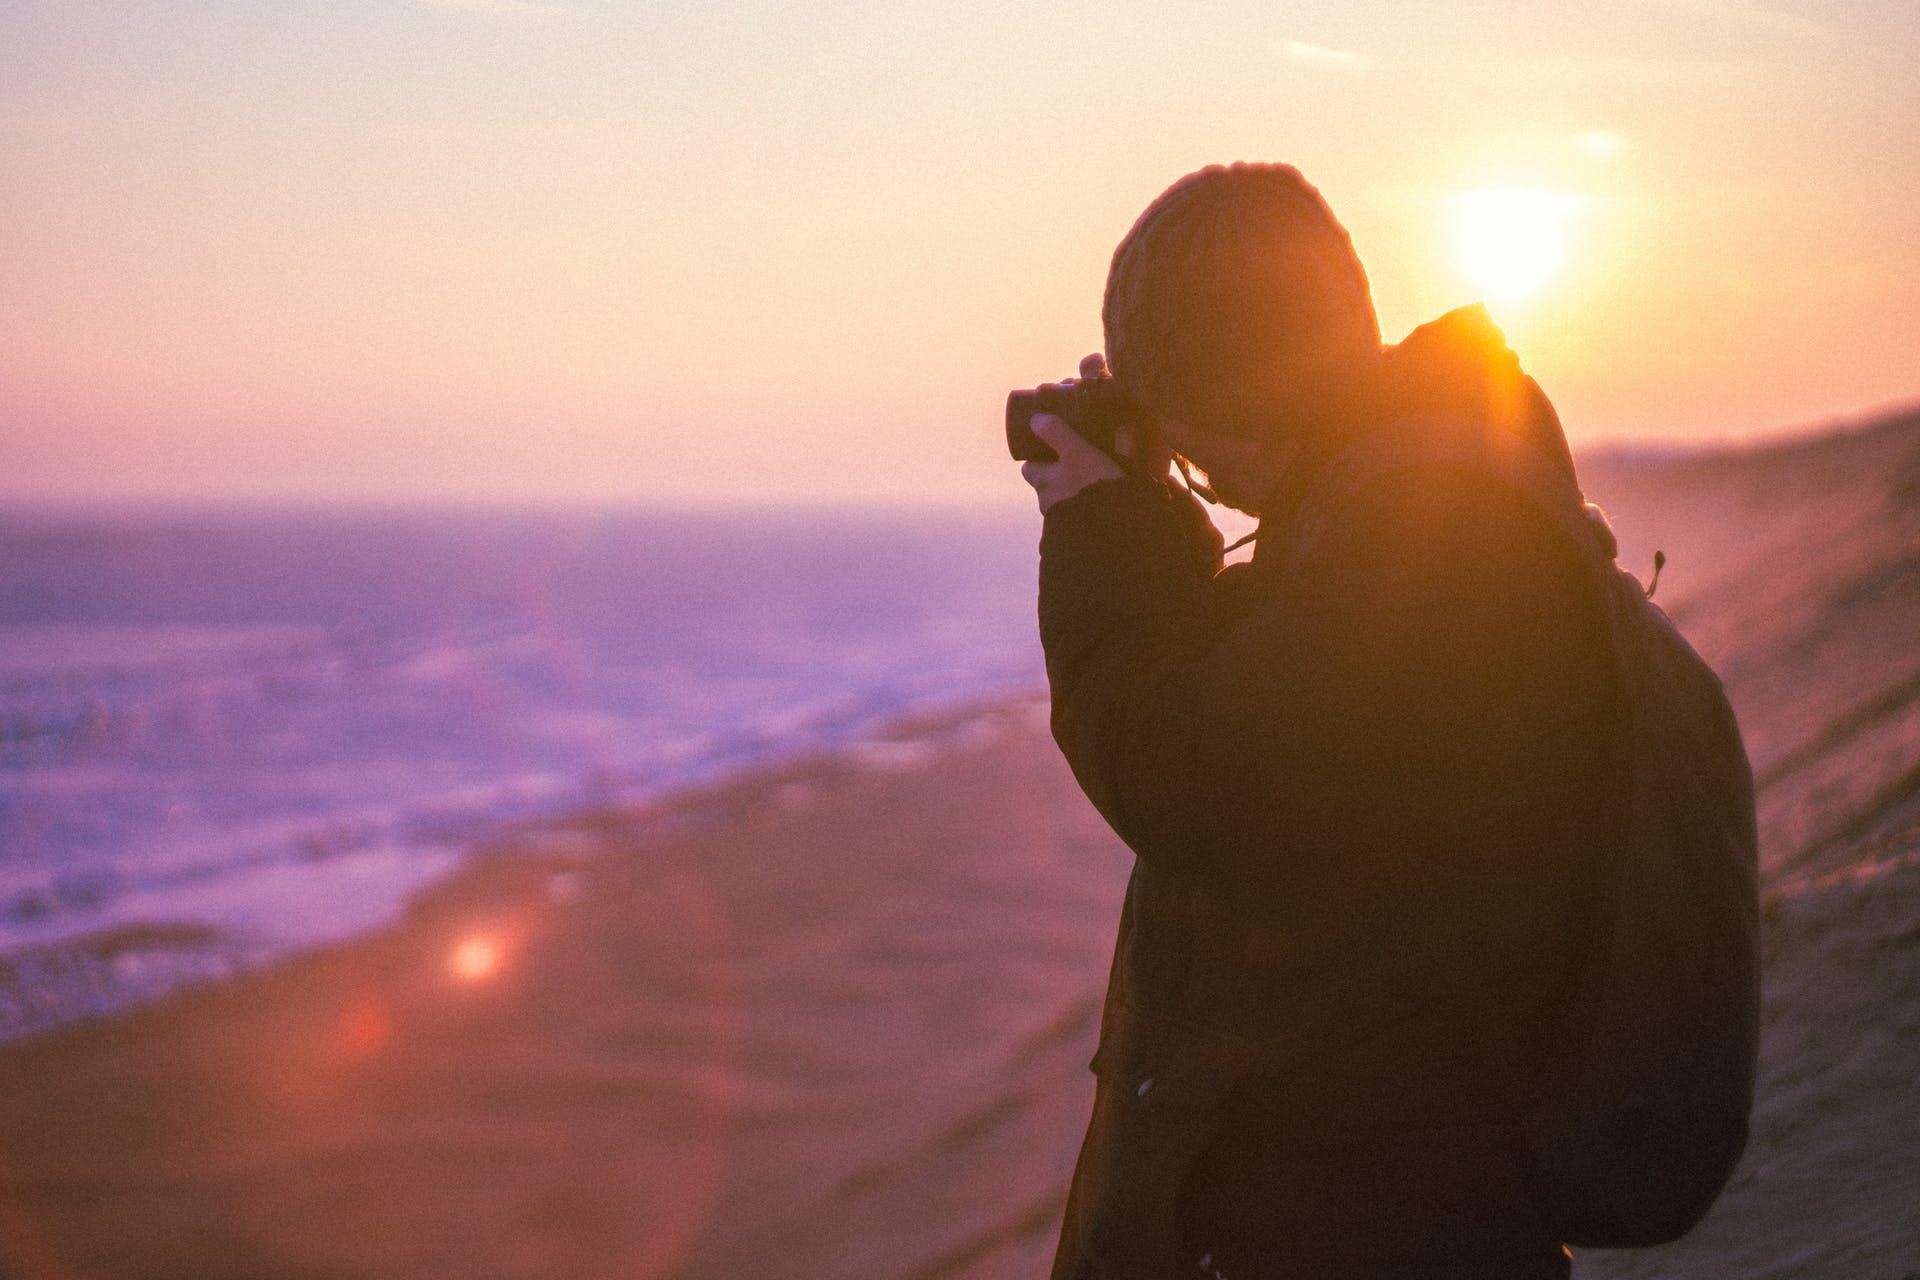 sunrise beach calm scenery peaceful scenic sunset ocean dawn person